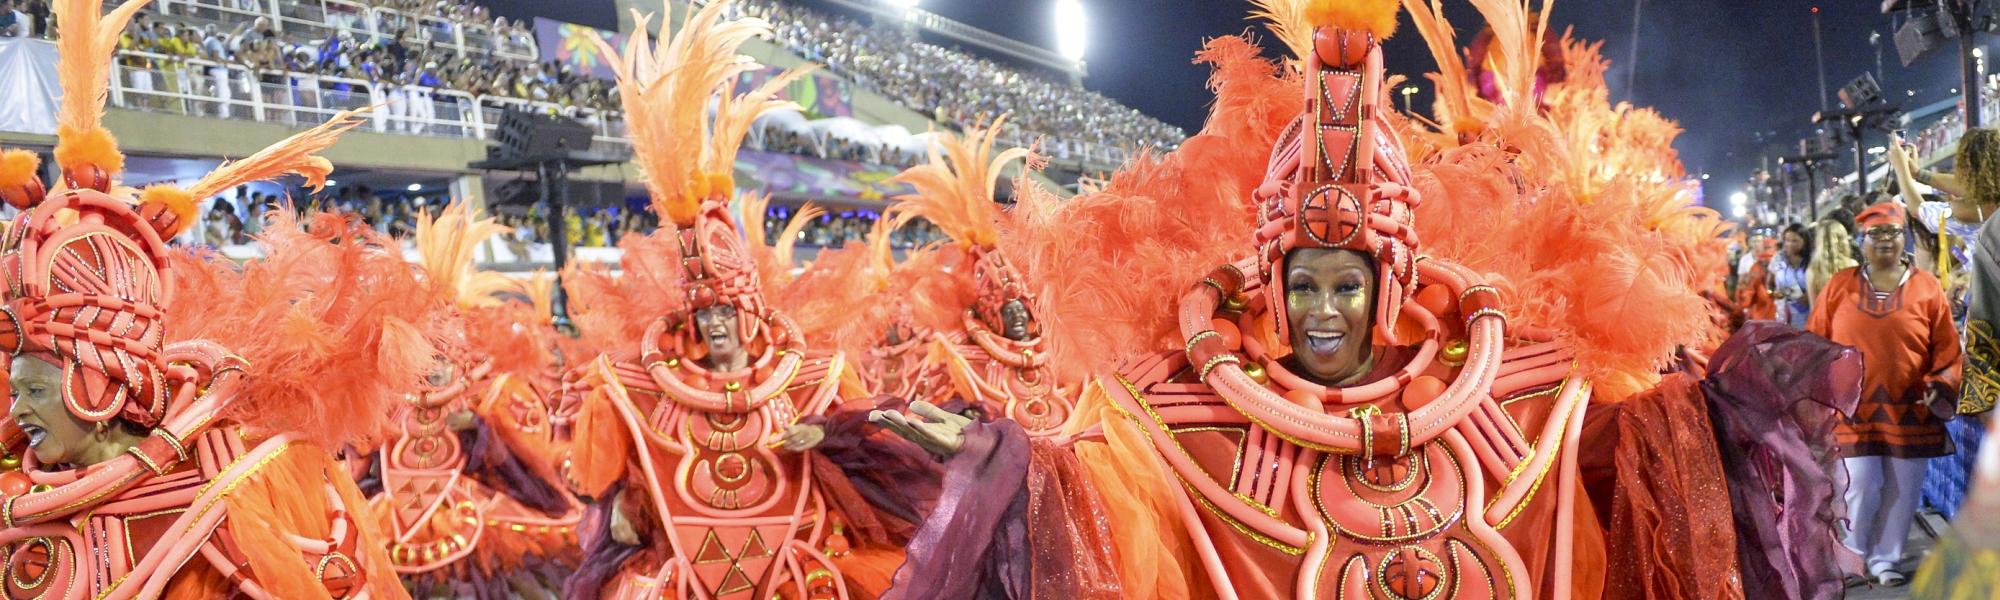 Carnaval de Río de Janeiro Brasil